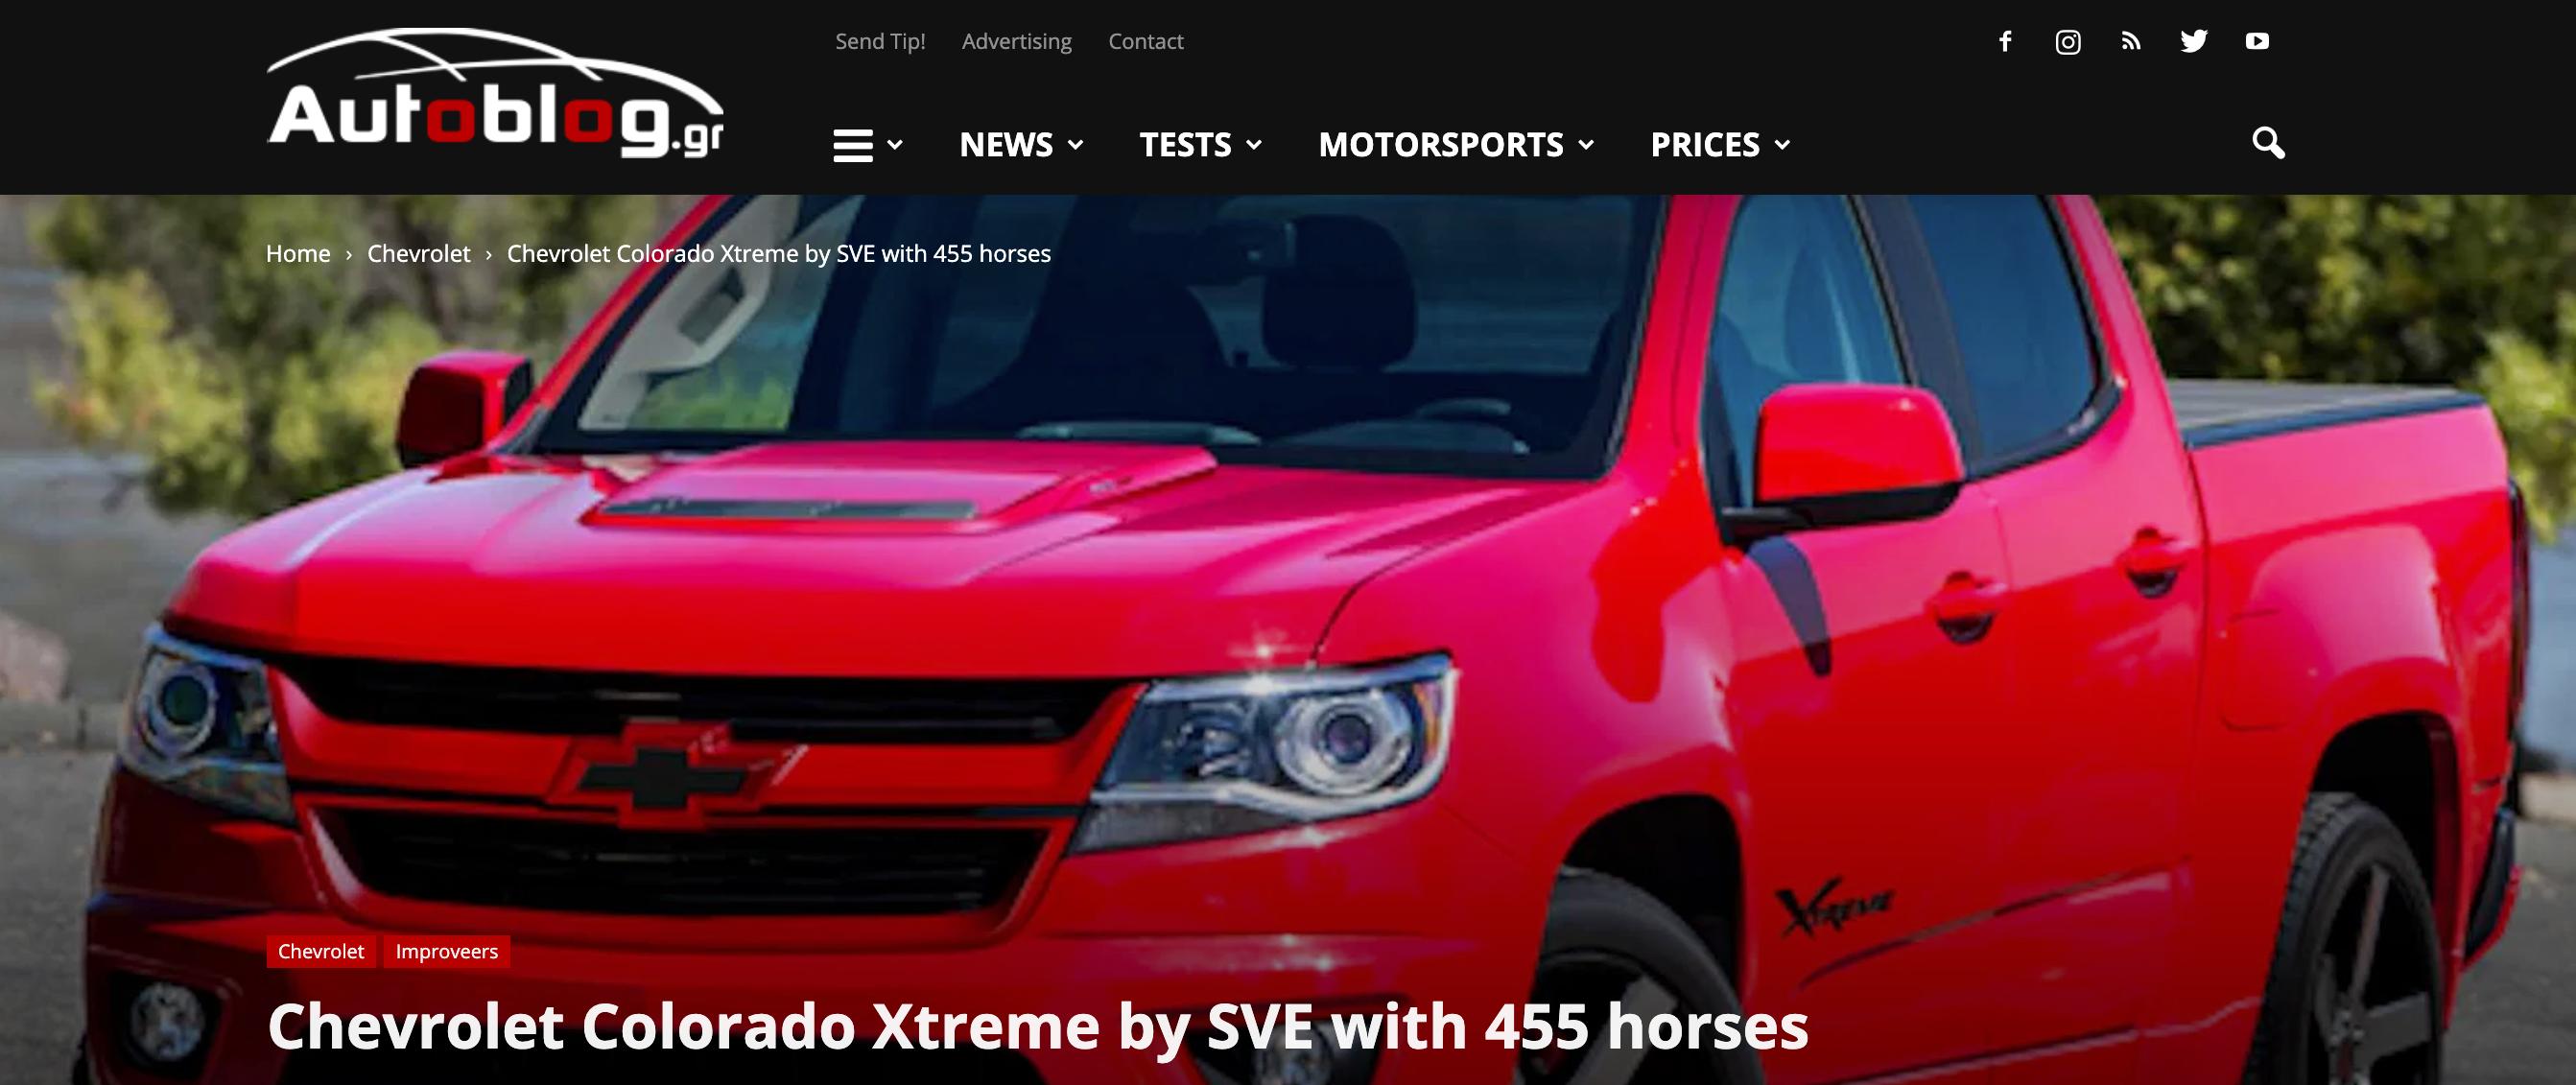 AutoBlog.gr article - eReleases press release service SVE Case Study